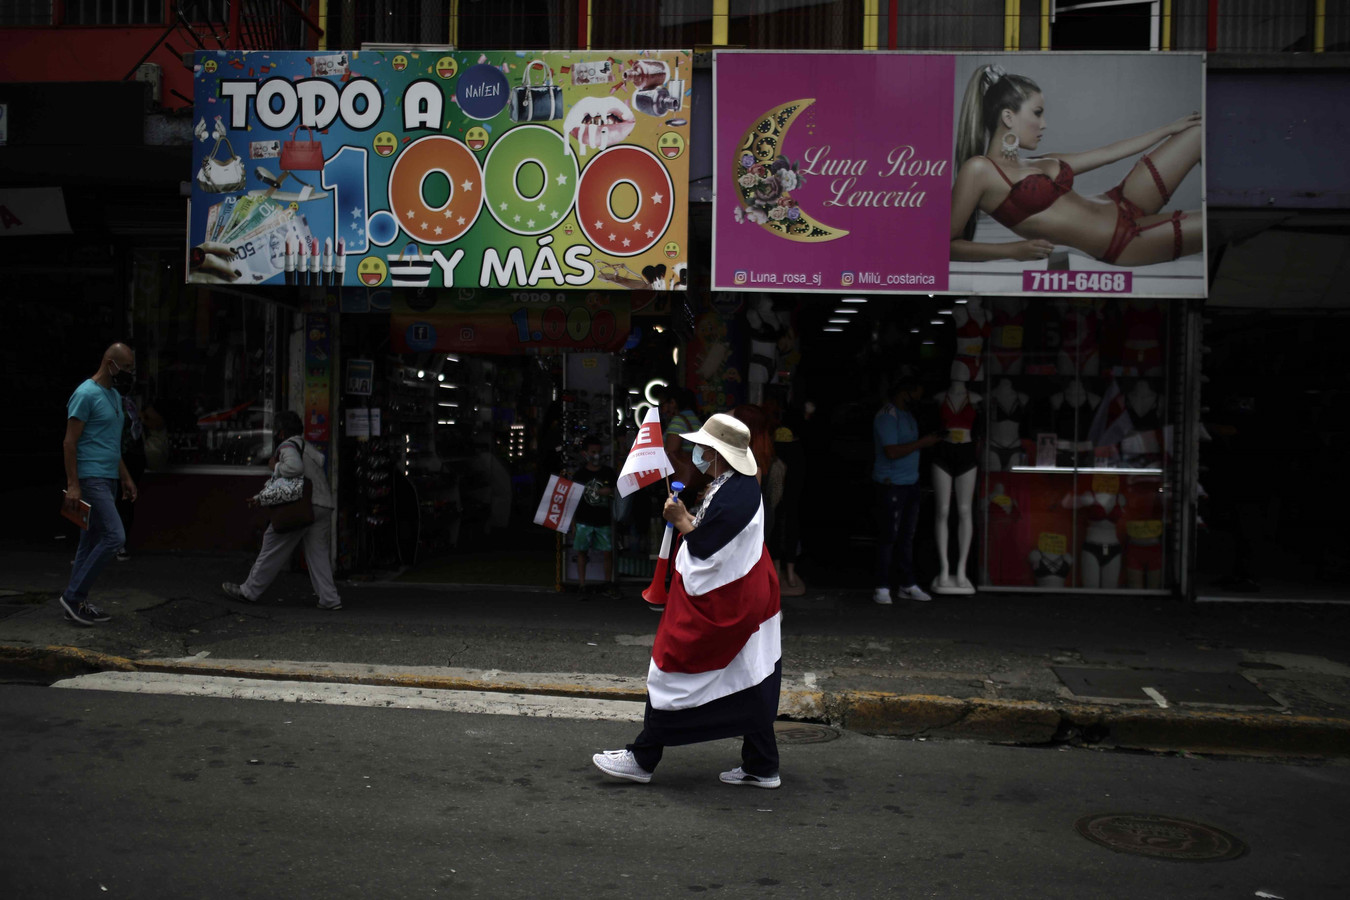 Straatbeeld van San José, Costa Rica (archiefbeeld)